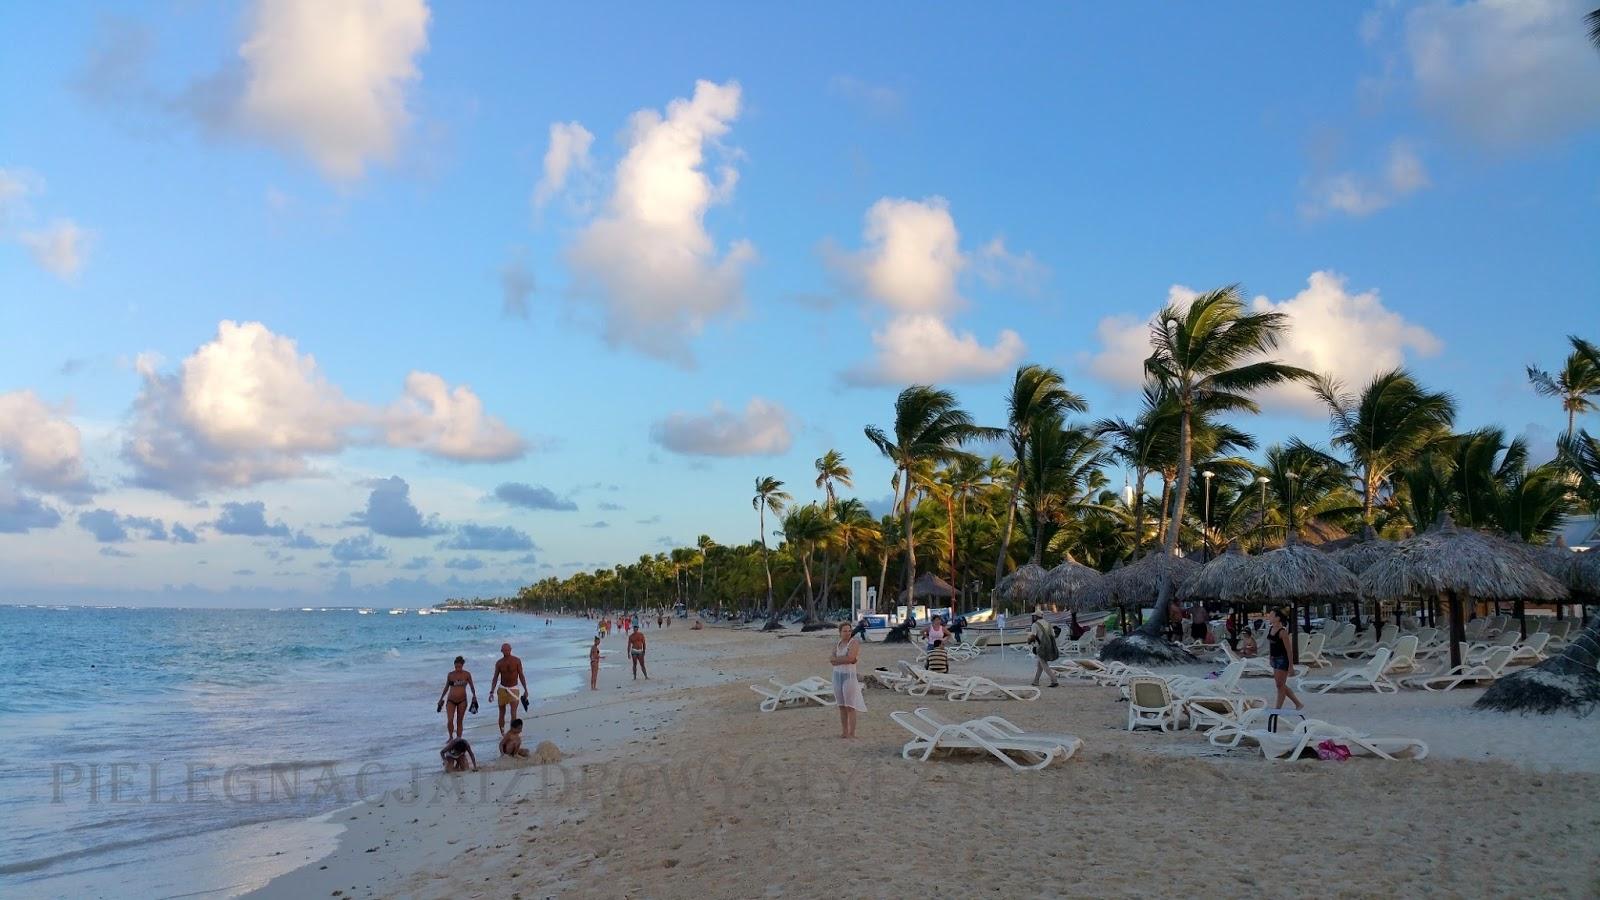 Rajskie plaże Dominikany - Hotel Grand Bahia Principe Punta Cana